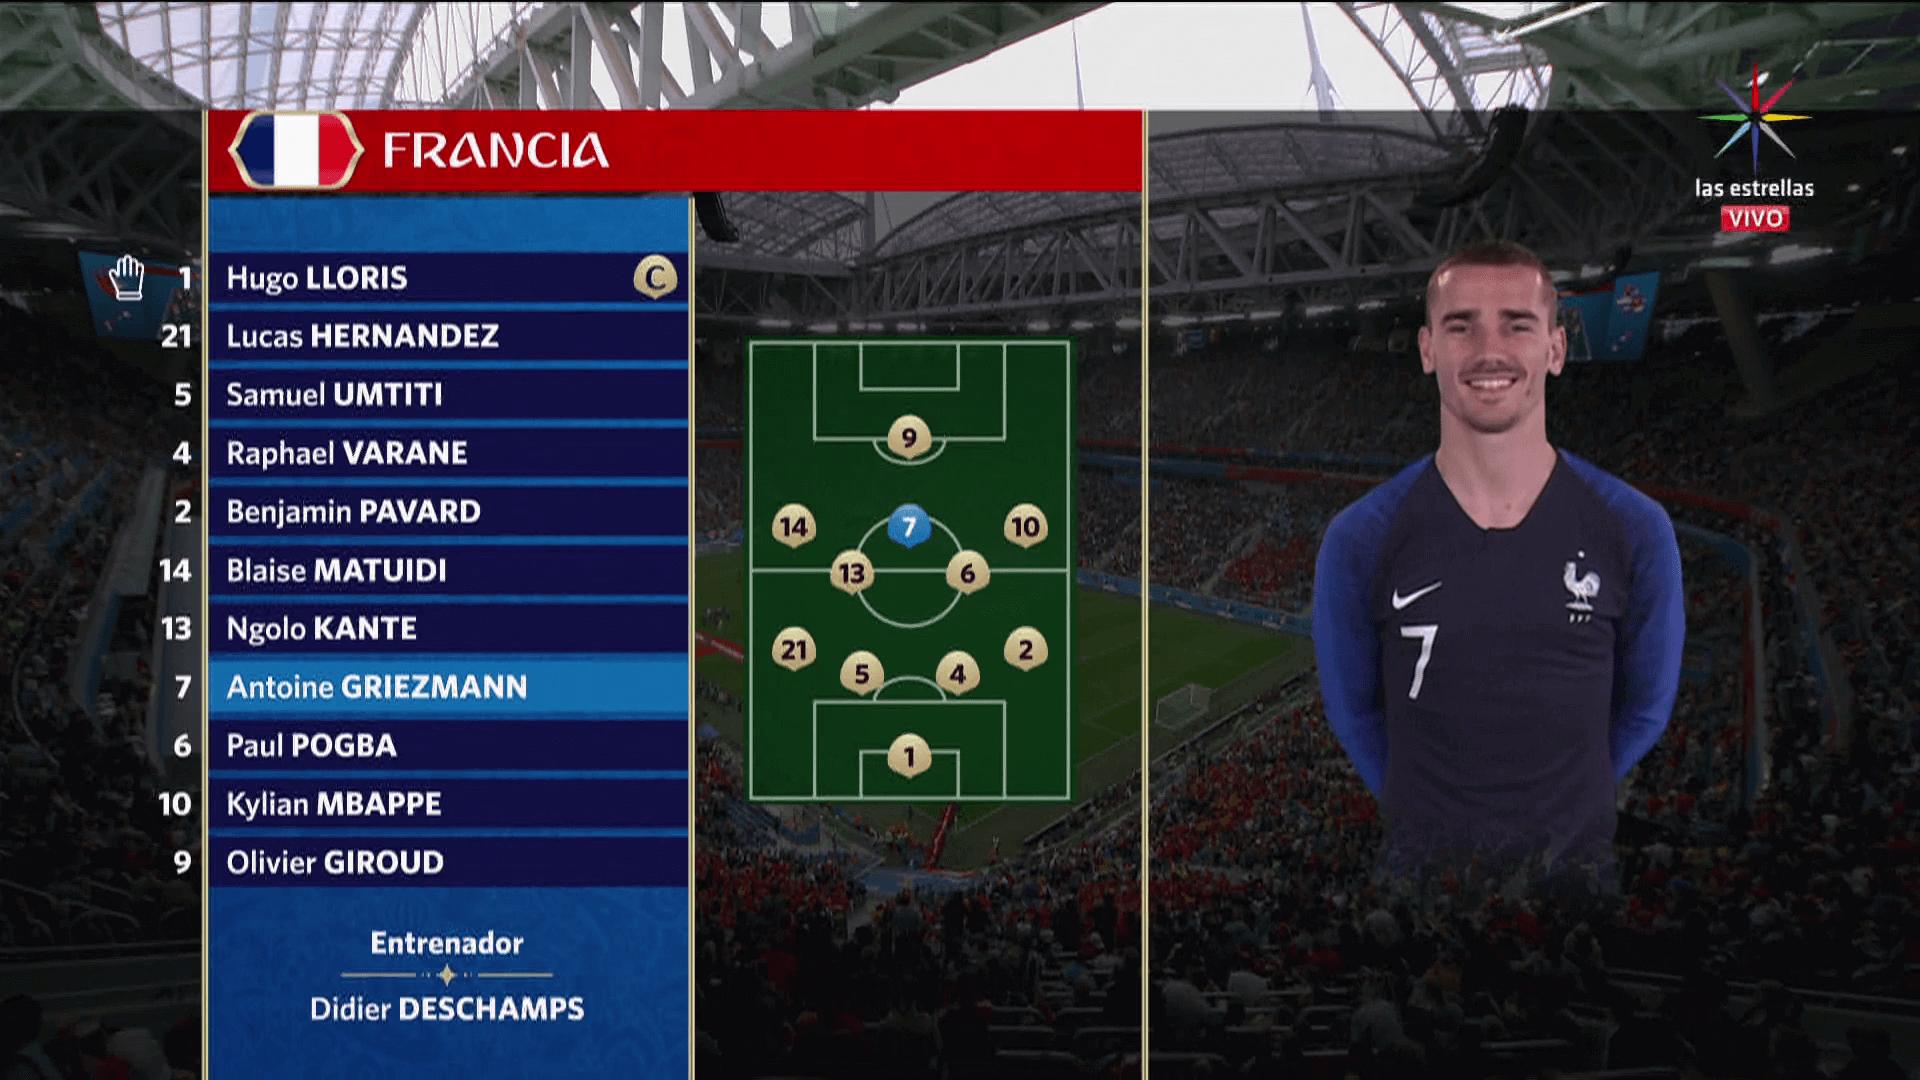 Francia vs Bélgica semifinales